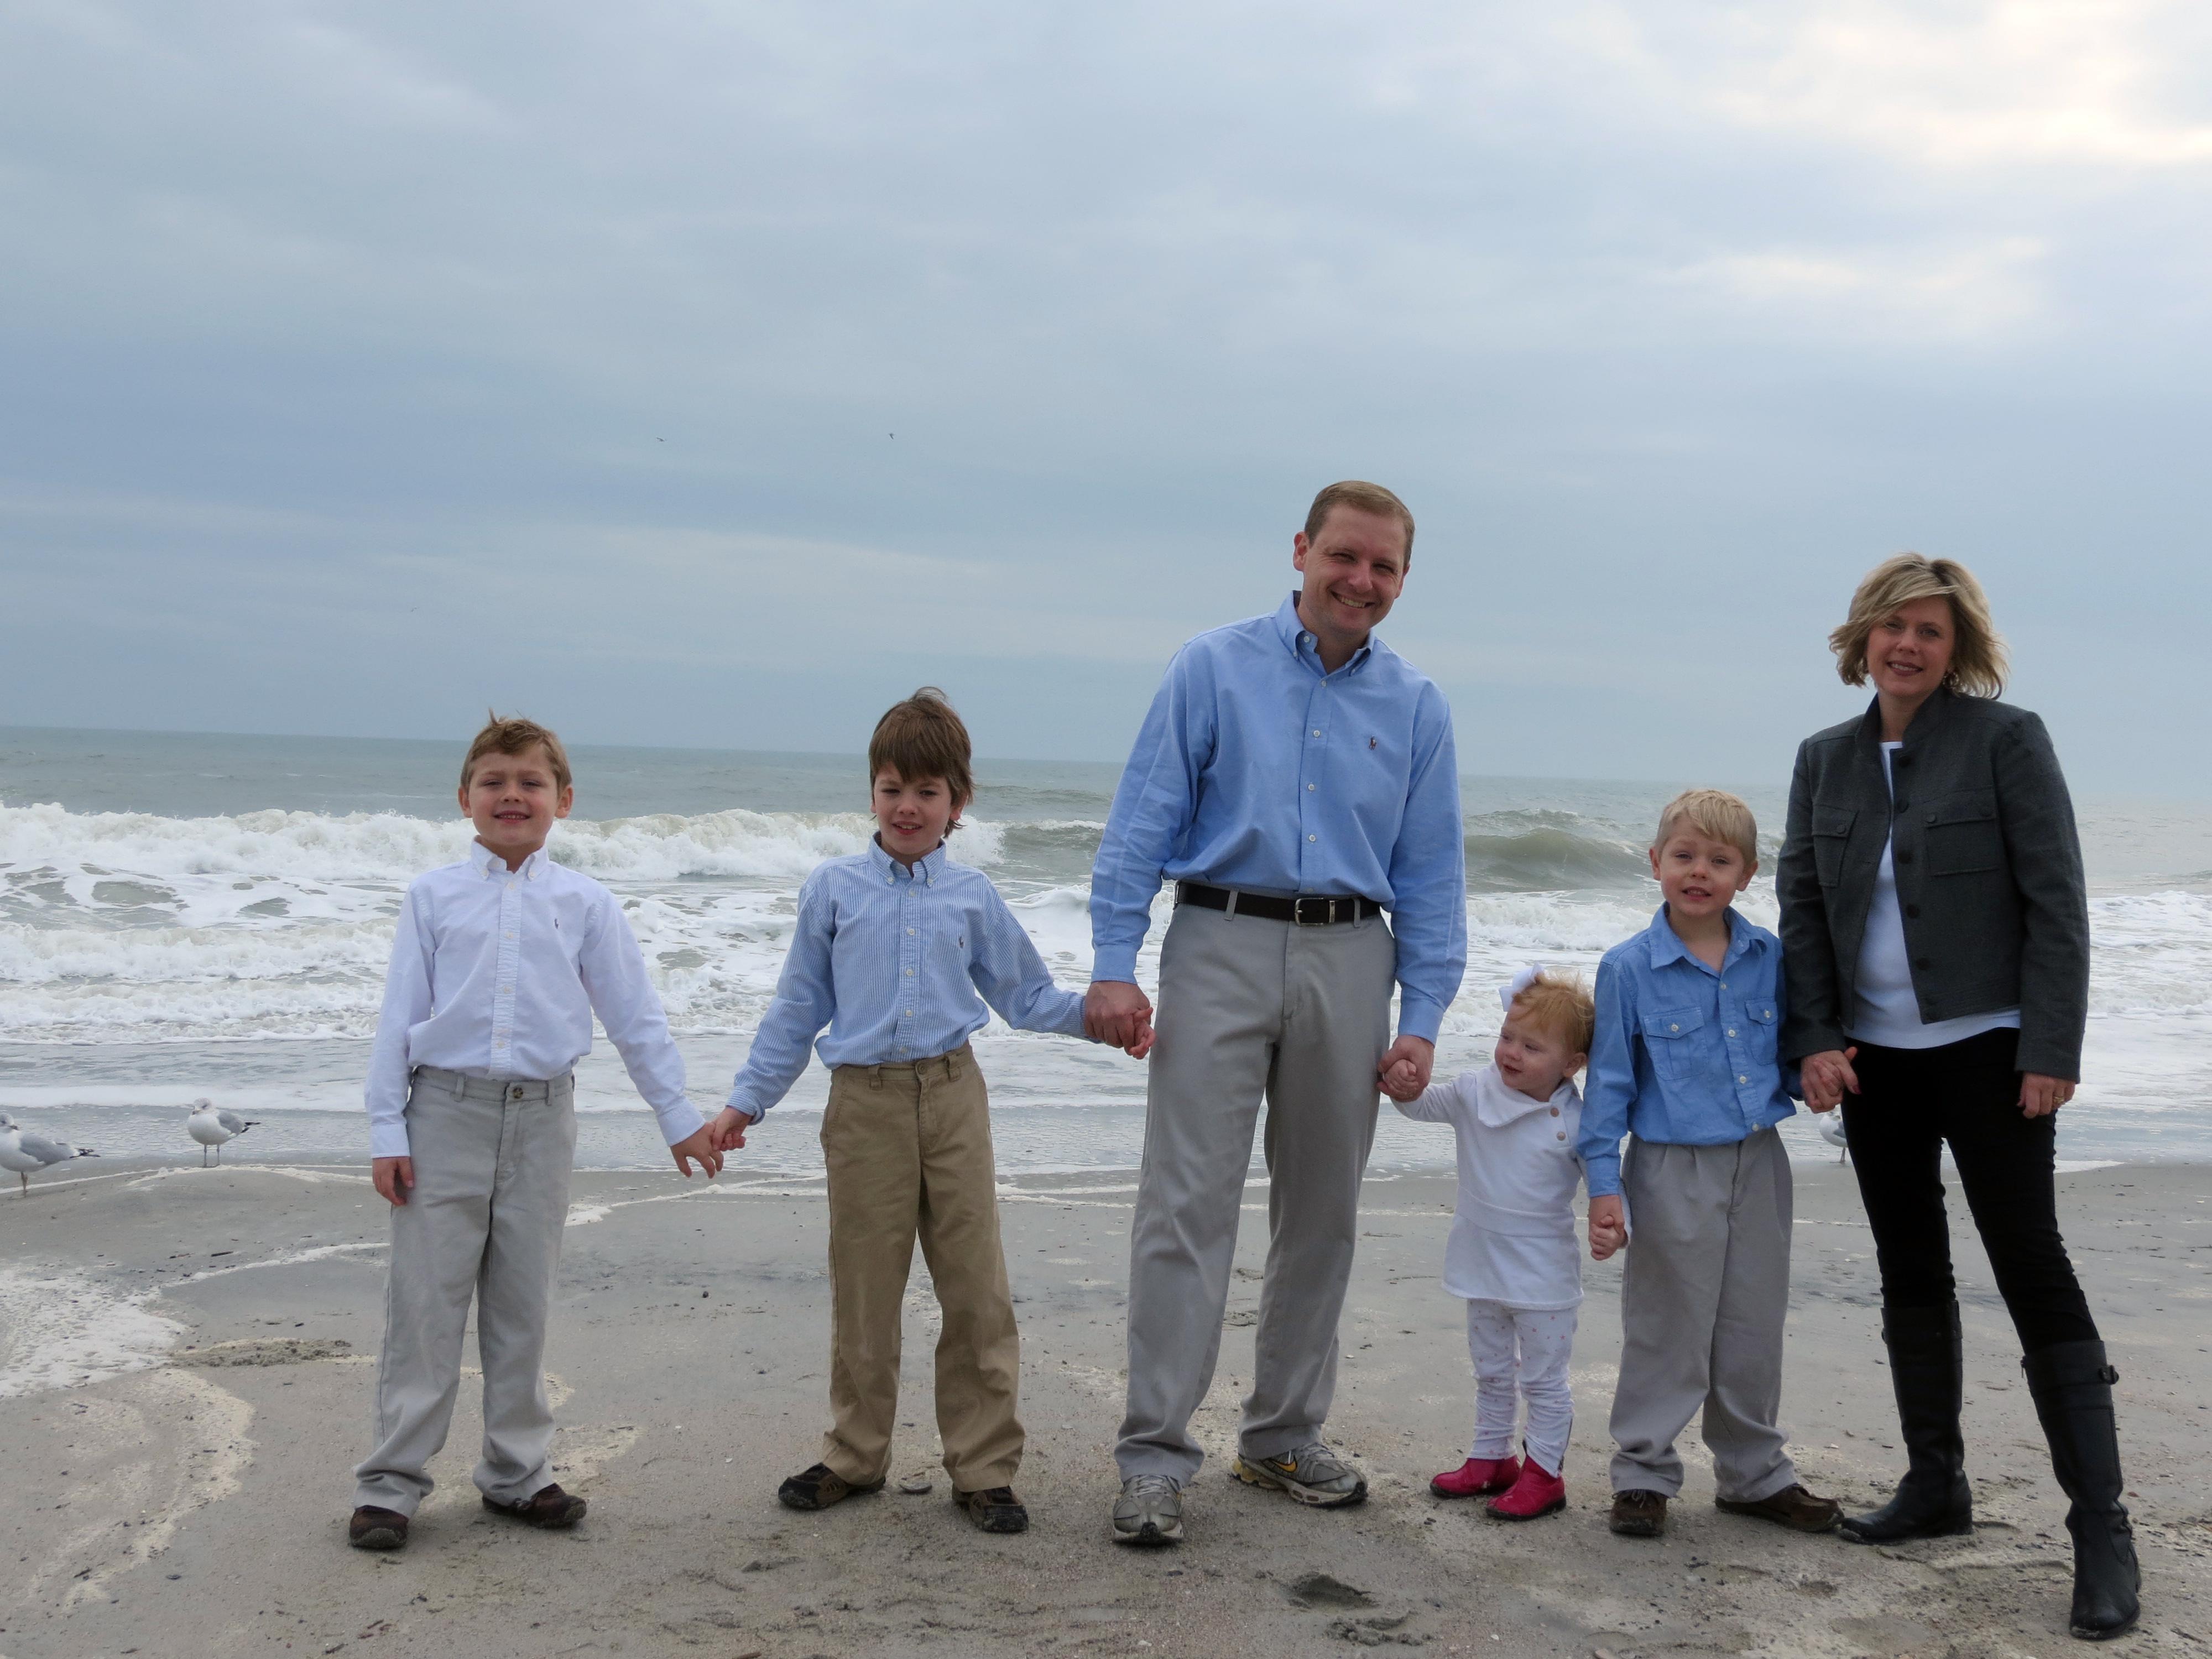 Landon with his familiy